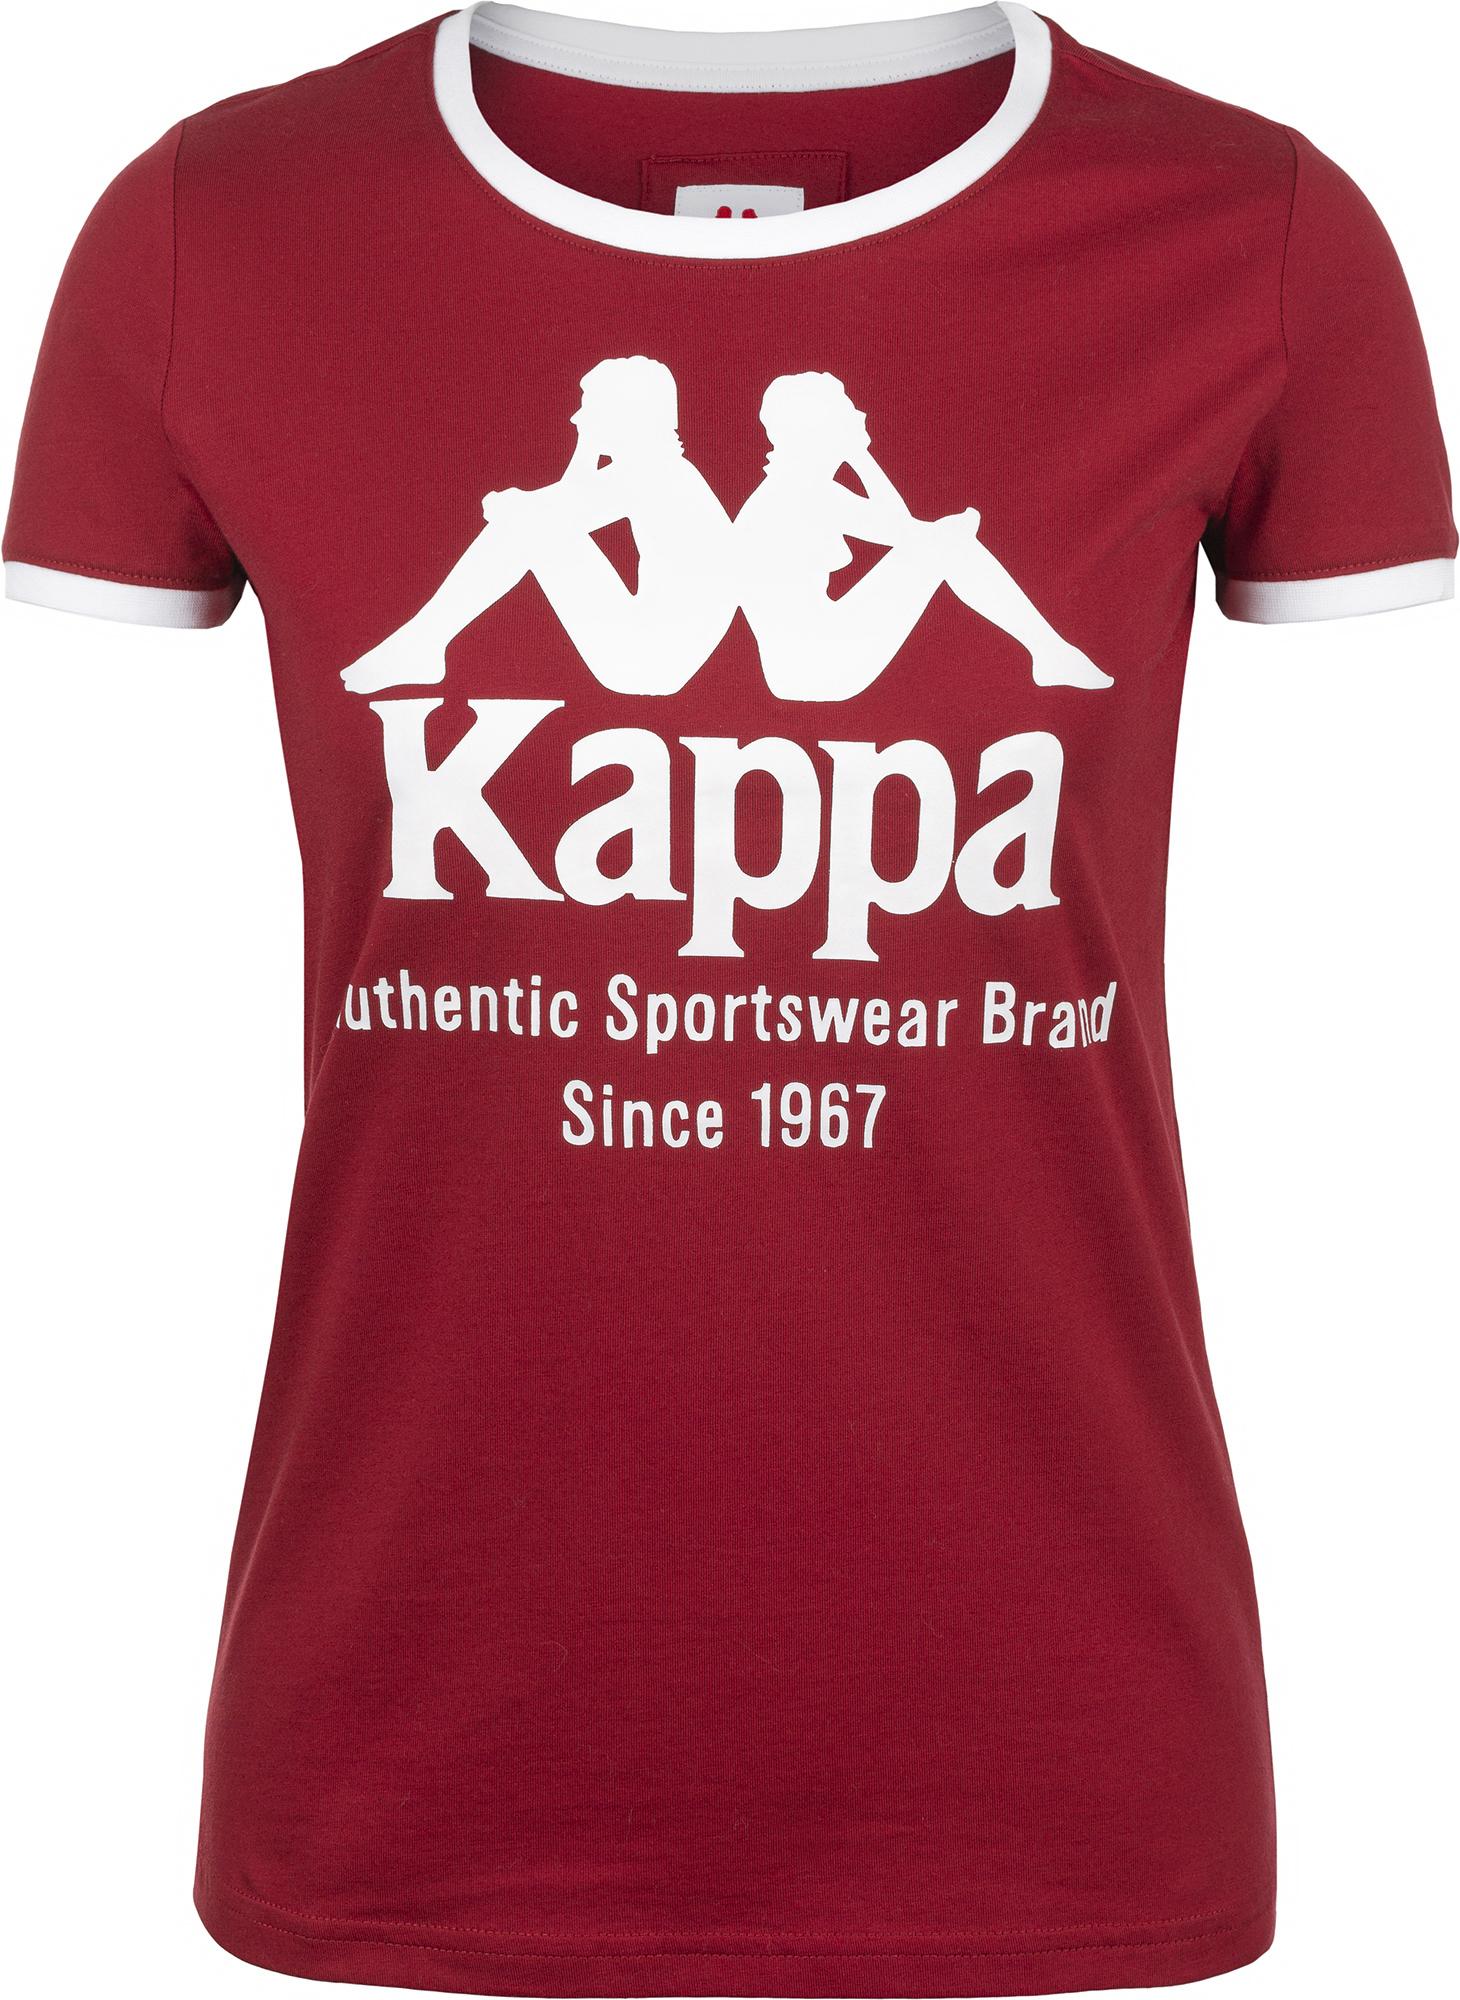 Kappa Футболка женская Kappa, размер 54 цена